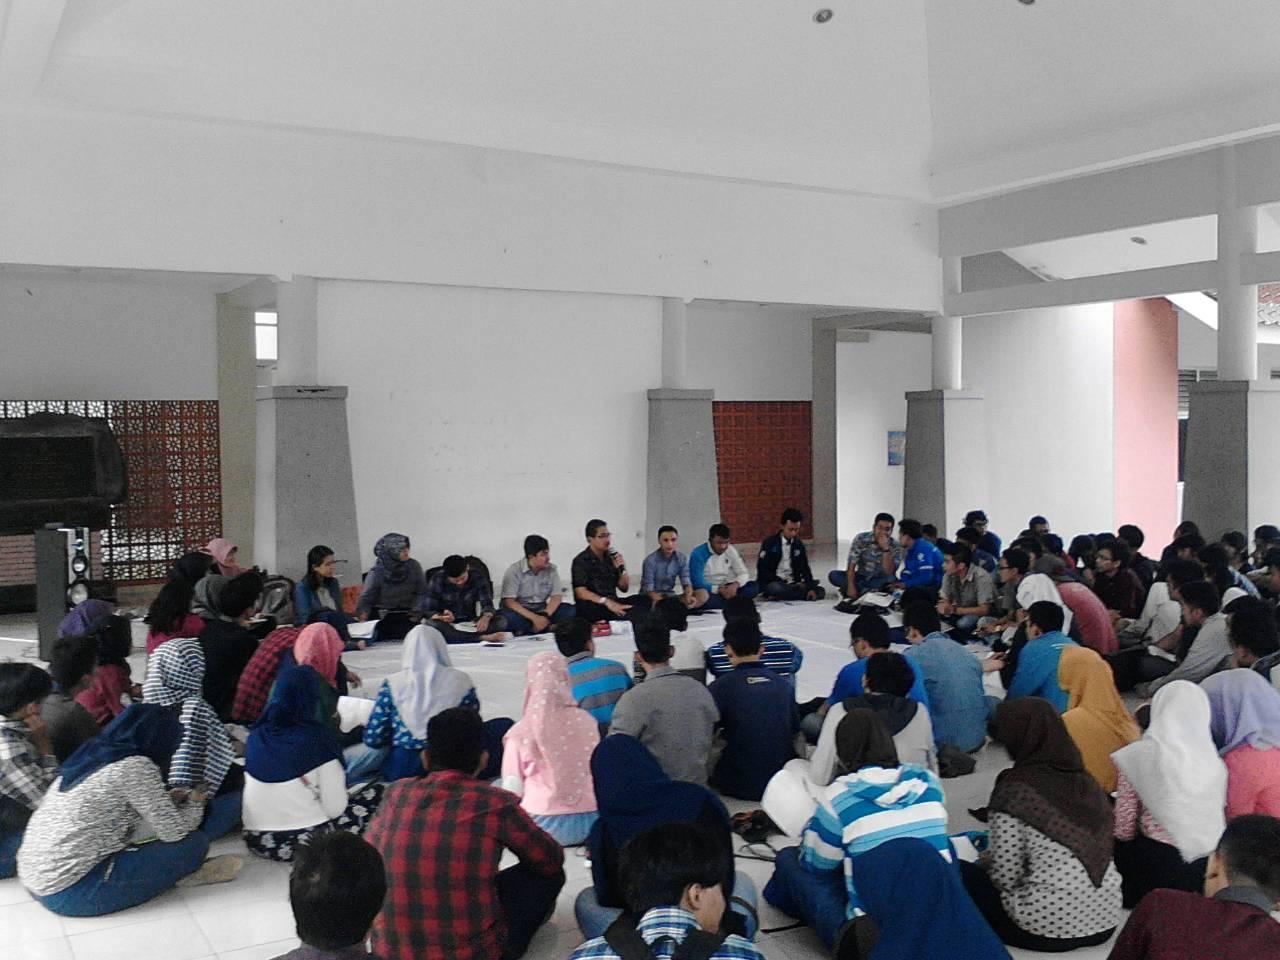 Dr. Pujiono S.H., M.Hum berdiskusi dengan para mahasiswa dalam acara Diponegoro Intellectual Forum yang diadakan oleh BEM Undip, Selasa (22/2). (Ayu/Manunggal)